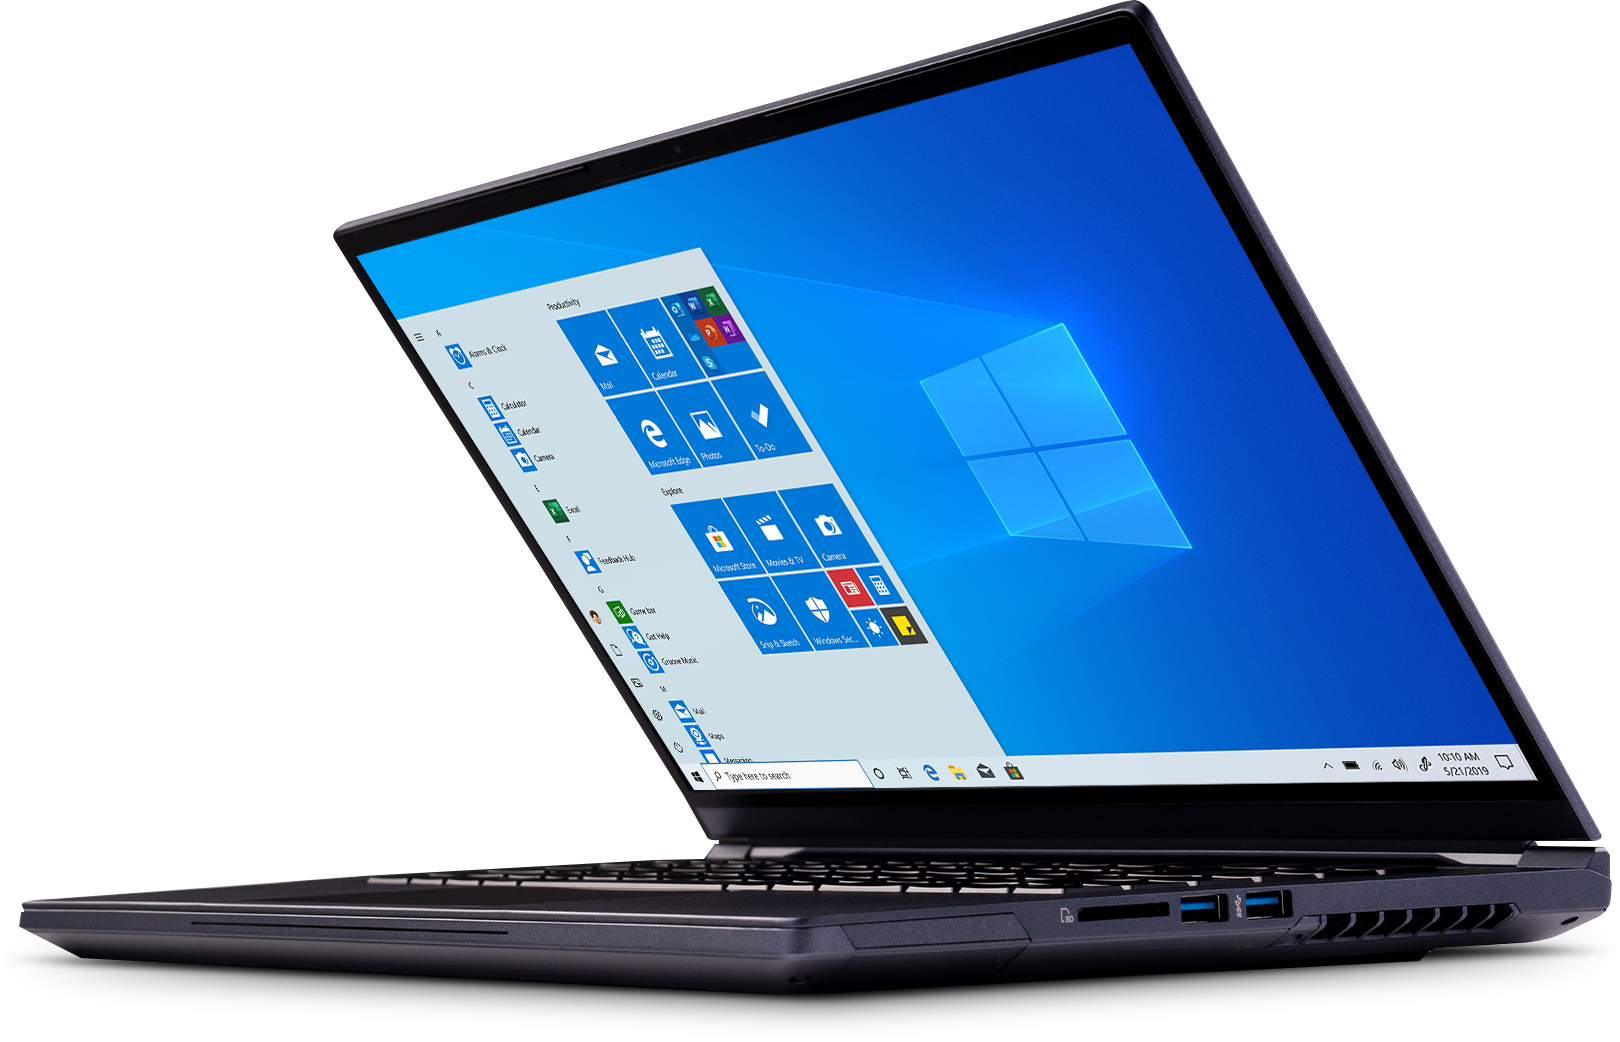 MAINGEAR ELEMENT MG-ELMT001-2070 Gaming Laptop